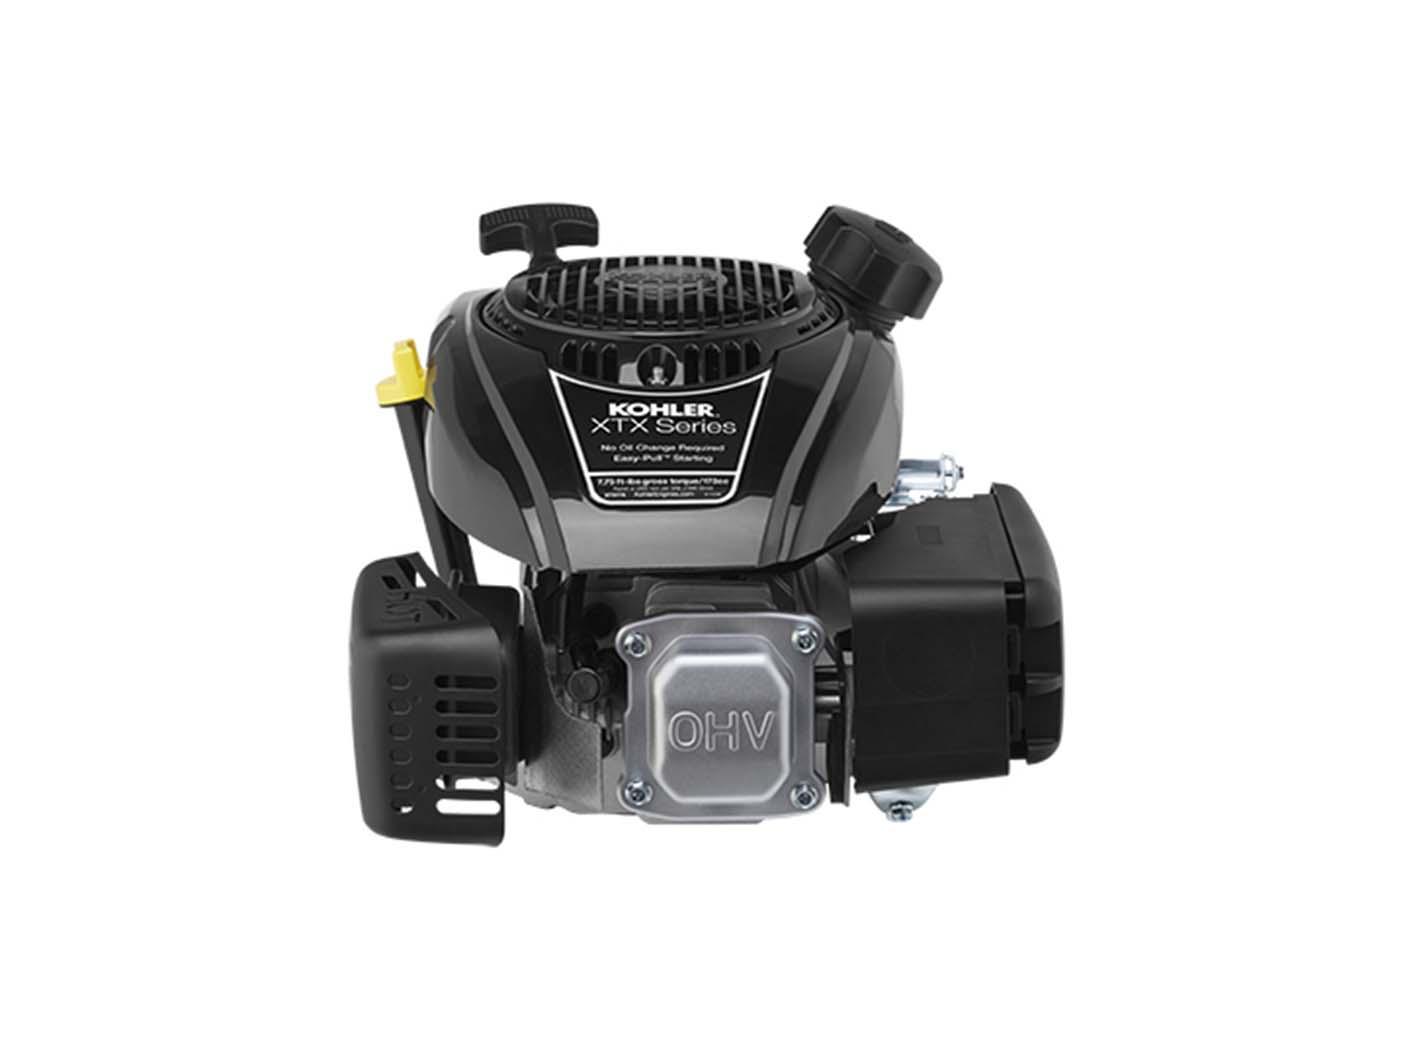 Kohler Engines a Demopark 2017 -  -Componenti Fiere Notizie - MC5.0-Macchine Cantieri 5